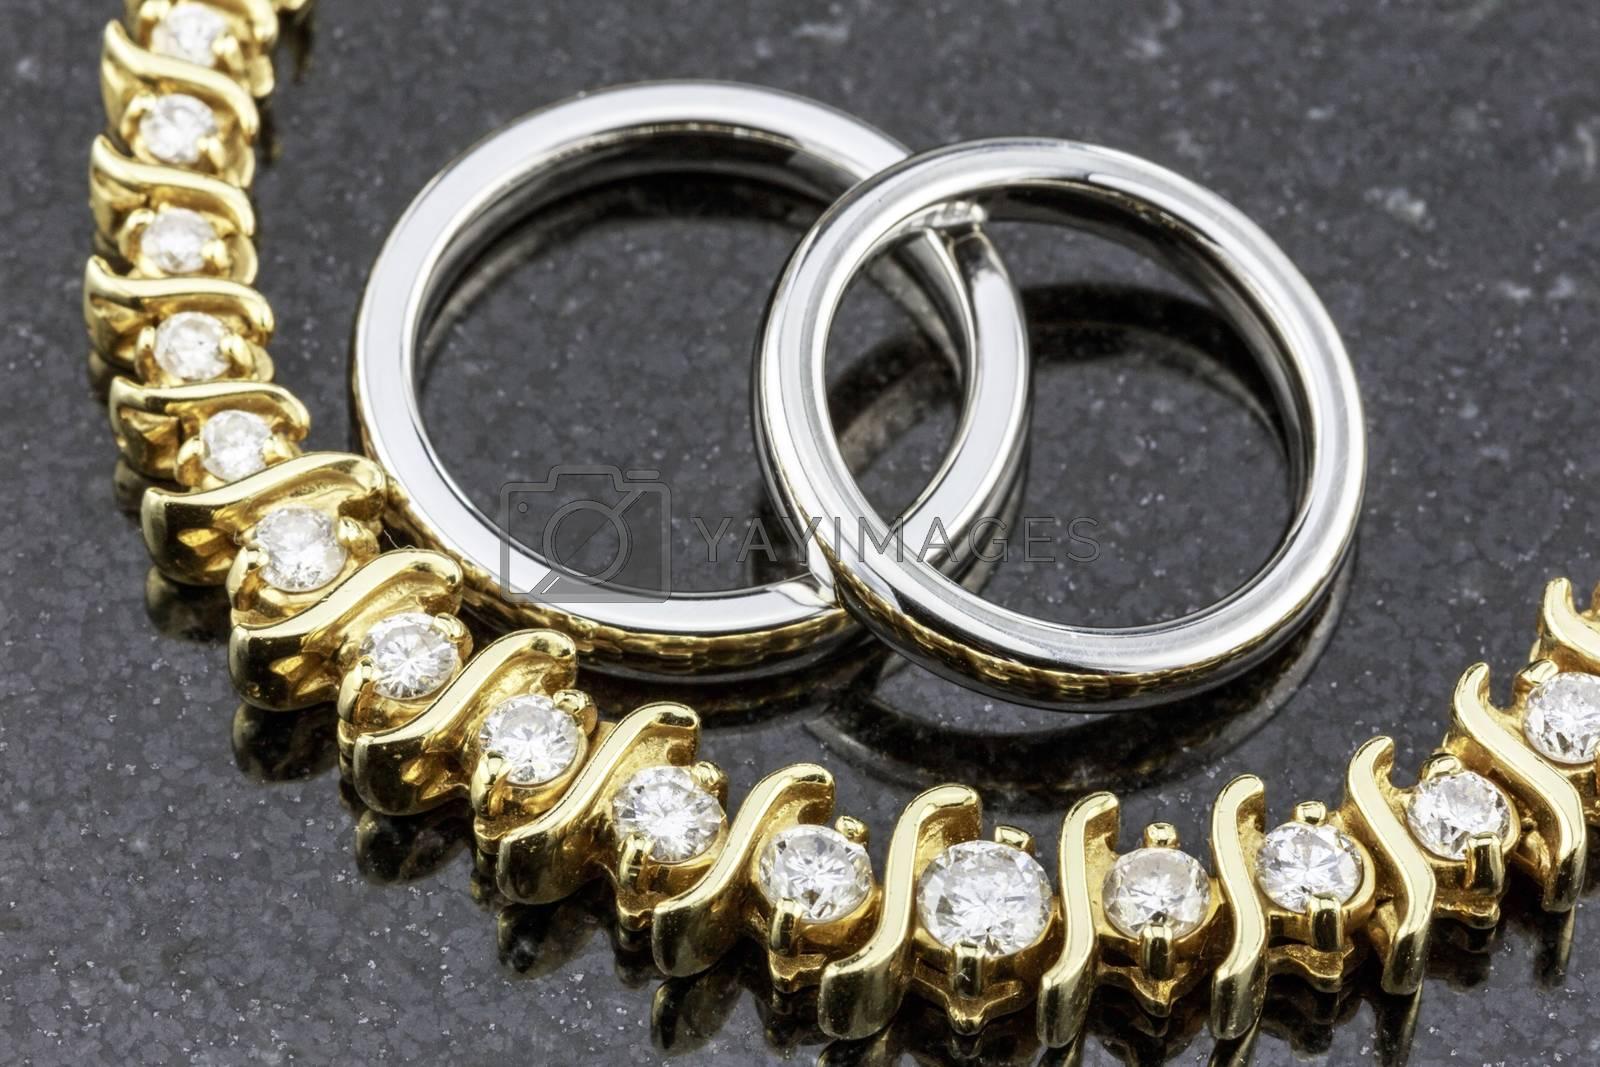 Titanium wedding bands and diamond necklace on black marble.